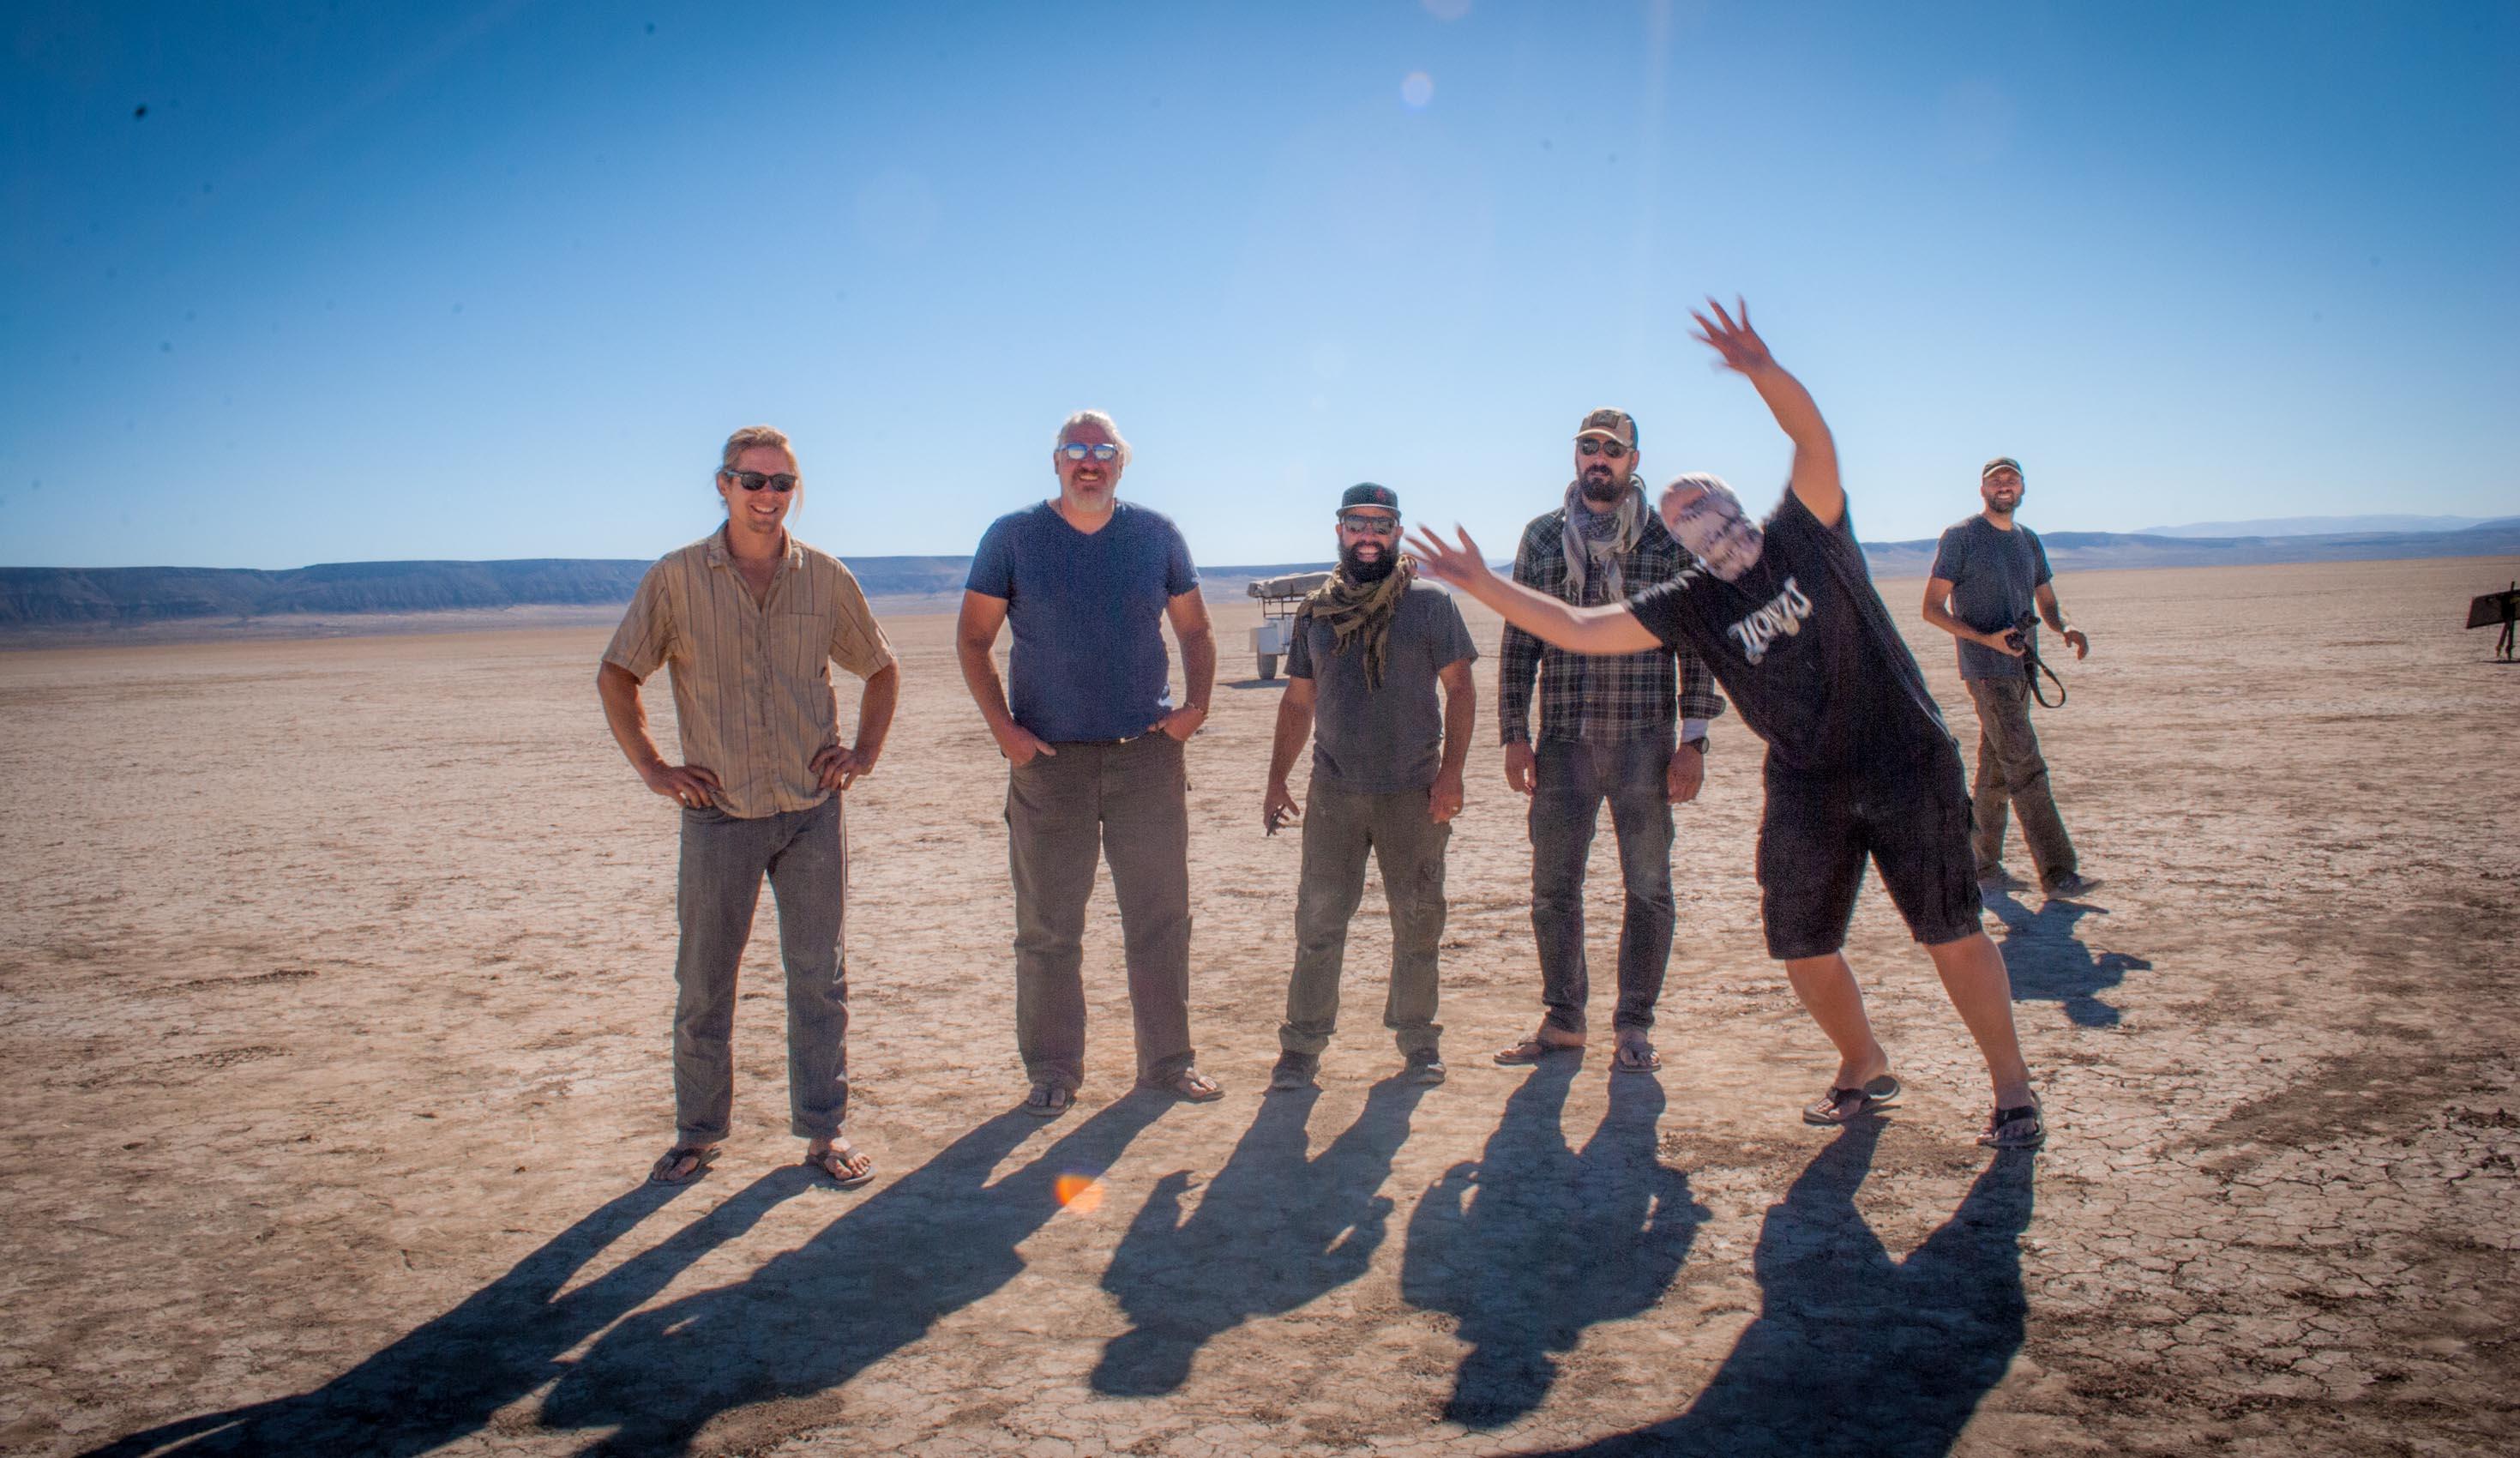 The boyz, Alvord Desert, A2A